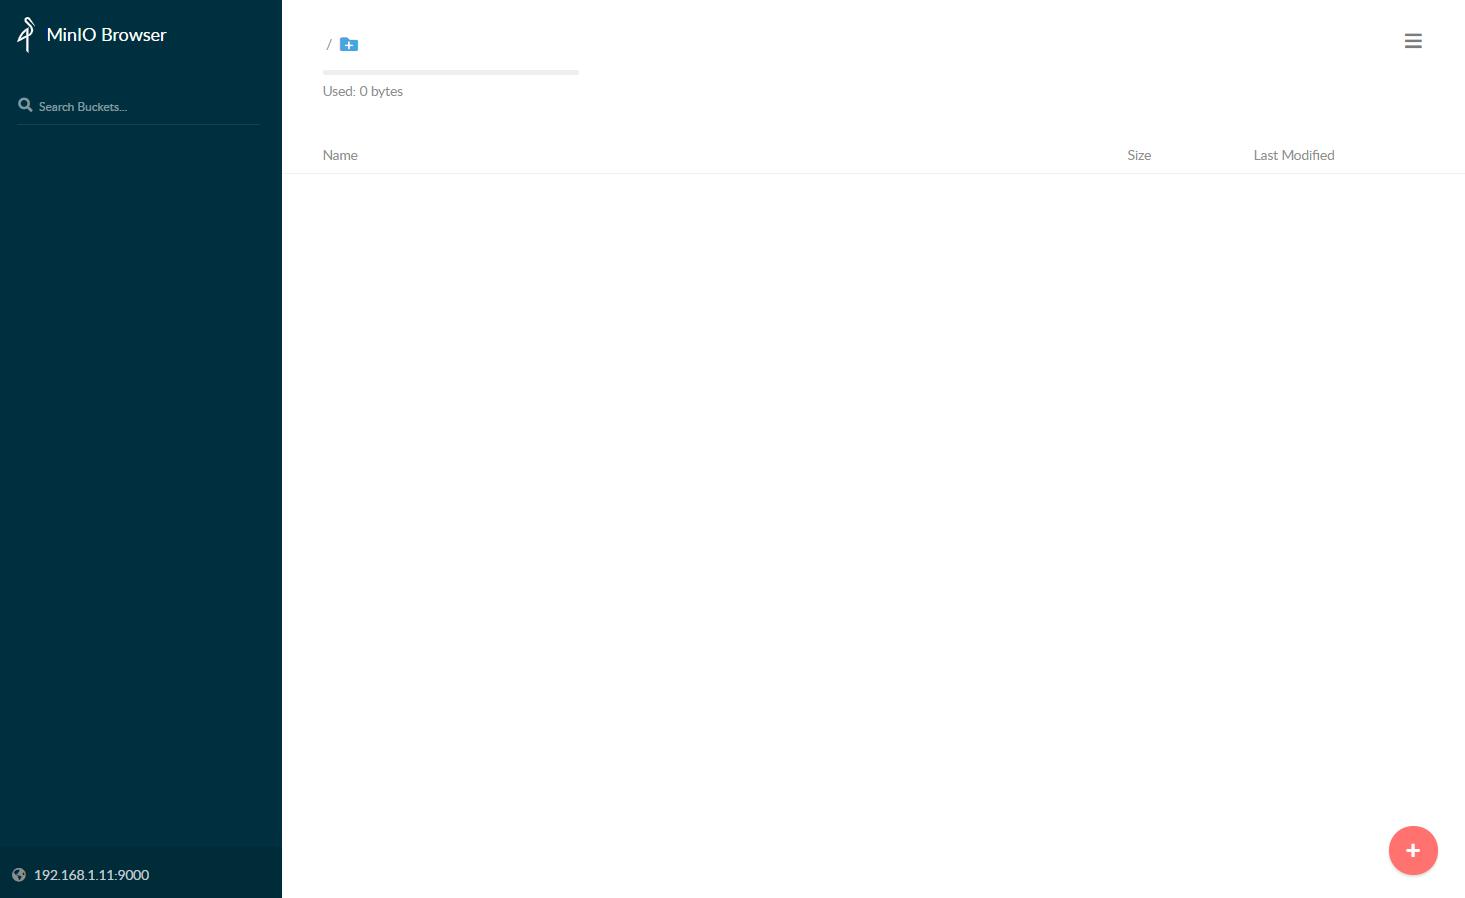 https://res.cloudinary.com/lyp/image/upload/v1579187807/hugo/blog.github.io/minio/dashboard.png